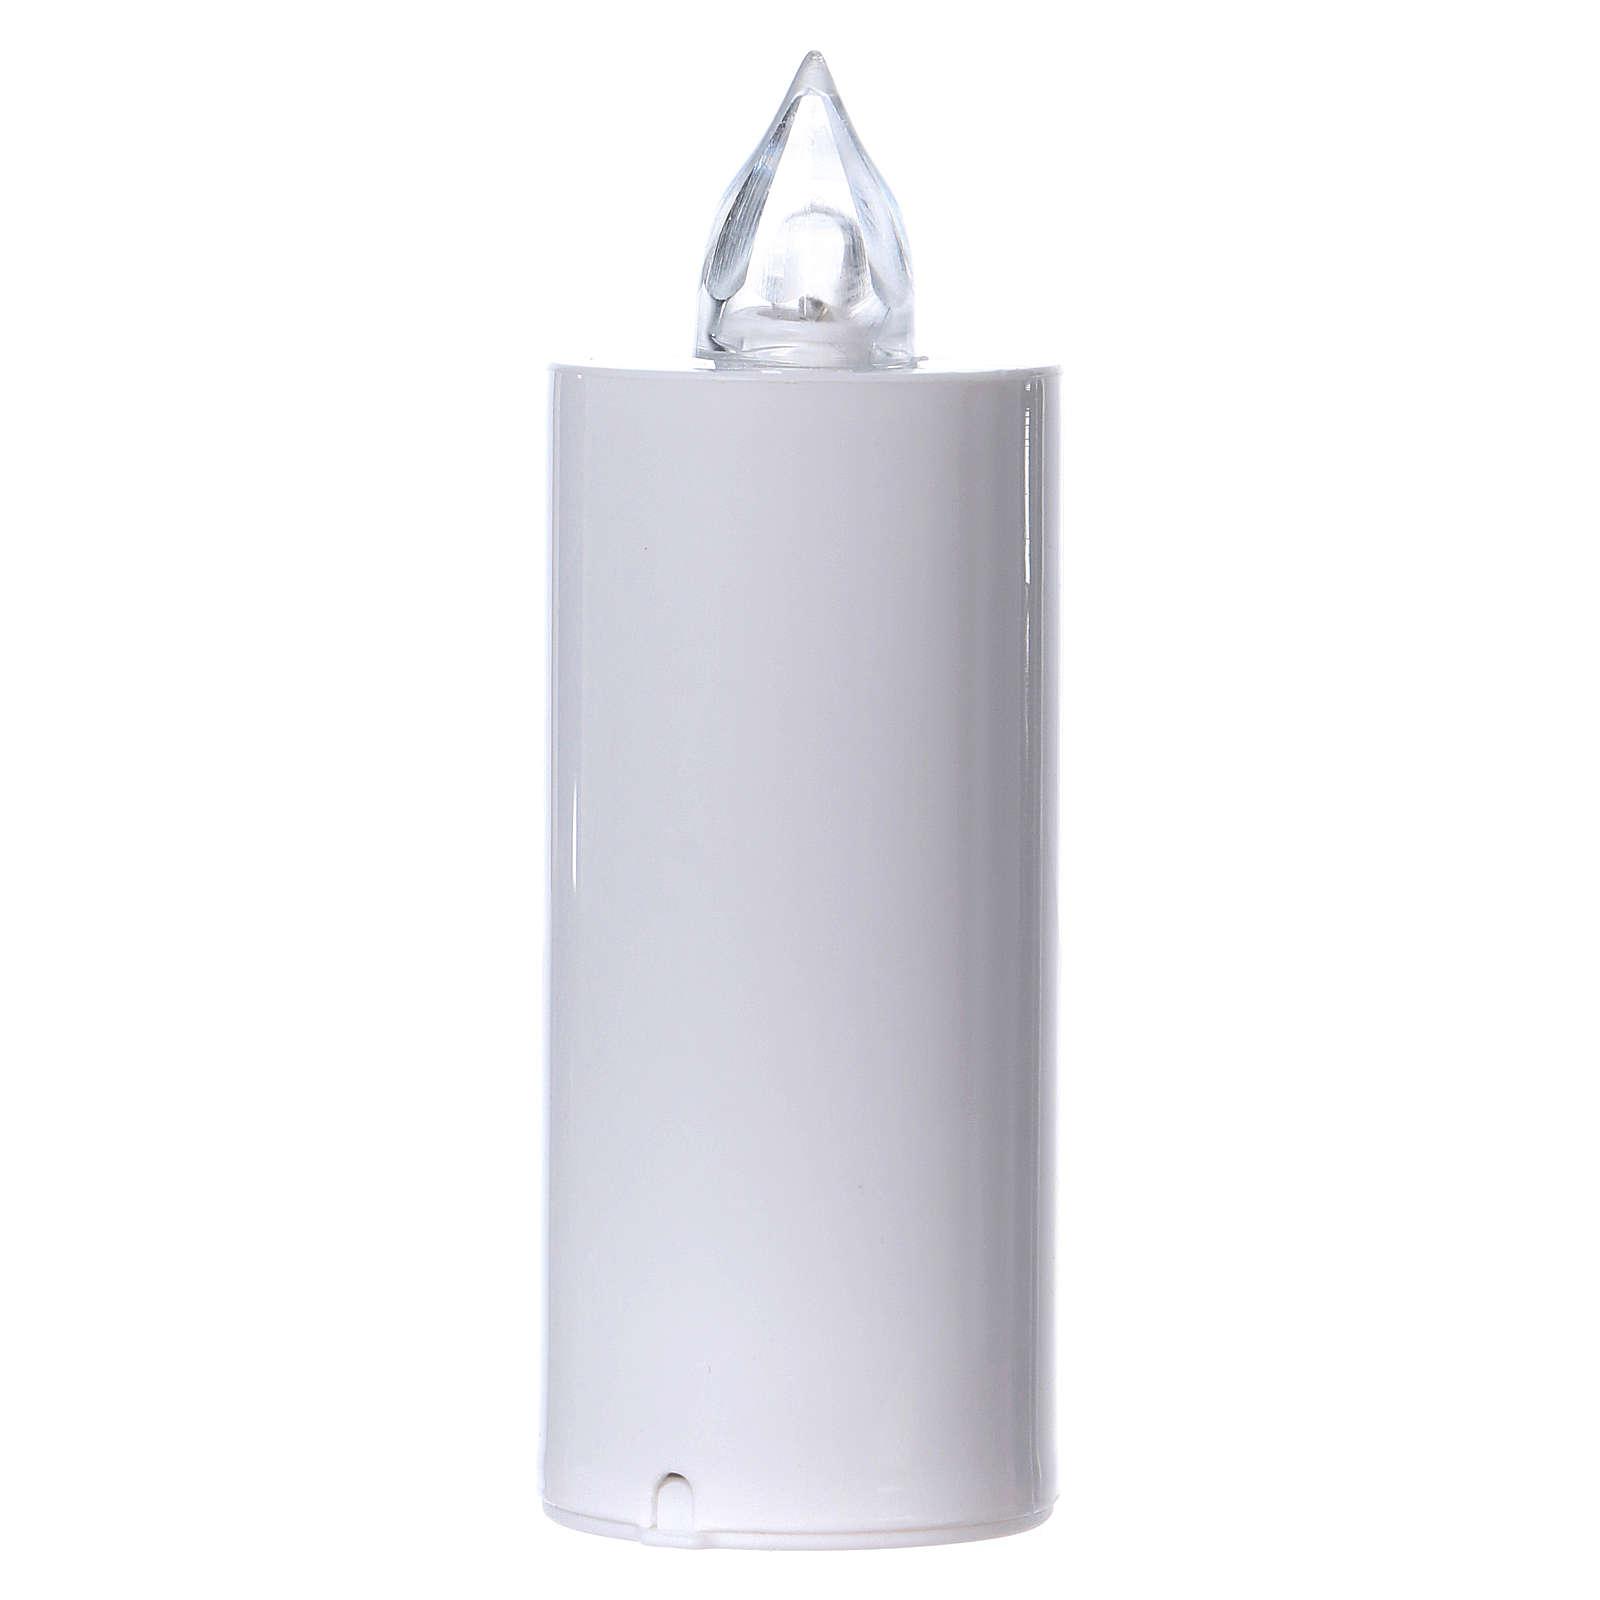 Vela votiva Lumada desechable blanca luz parpadeante blanca 3